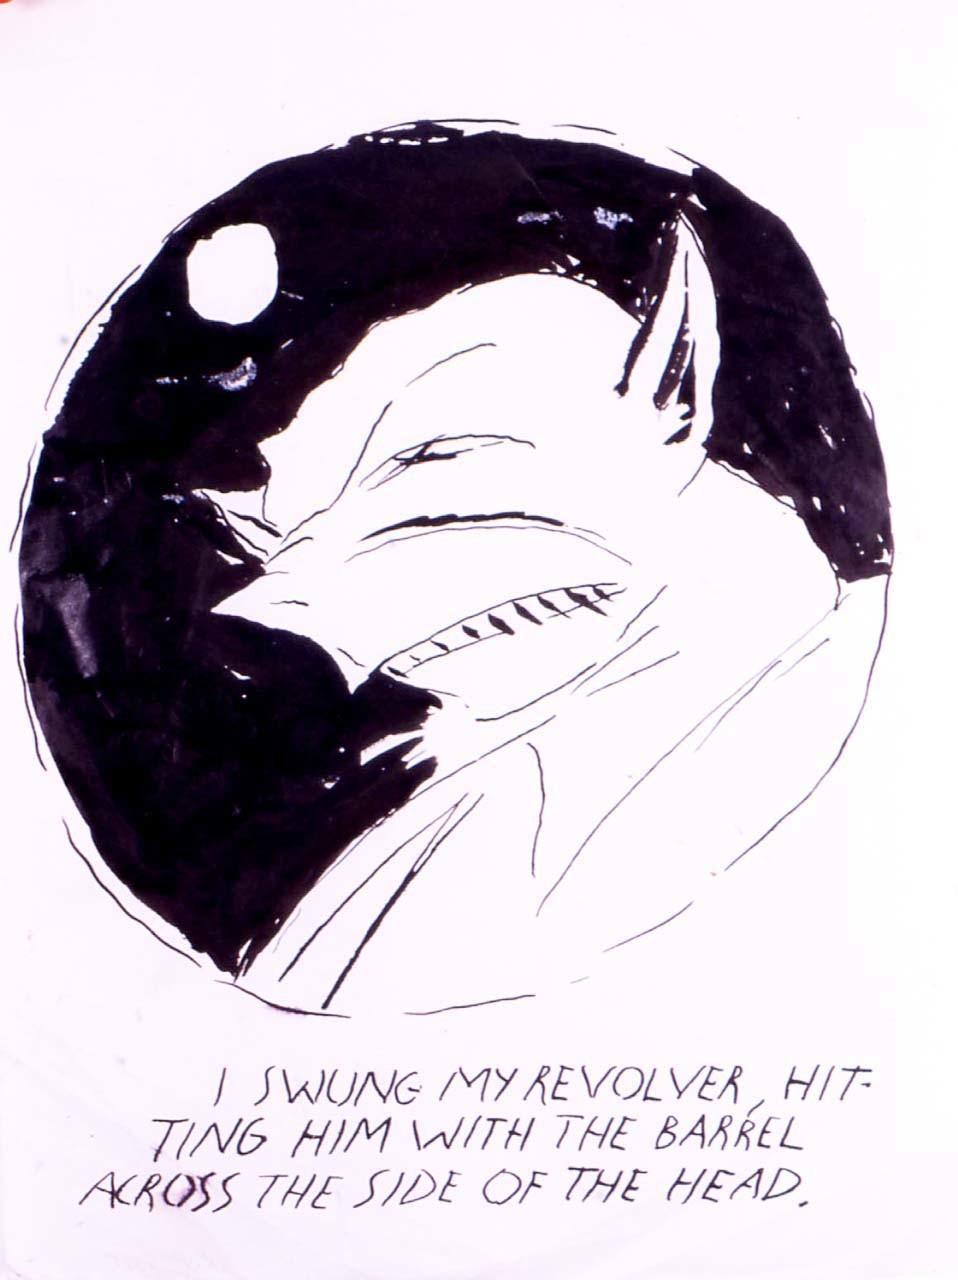 <p>No Title (I swung my revolver), 2001</p>